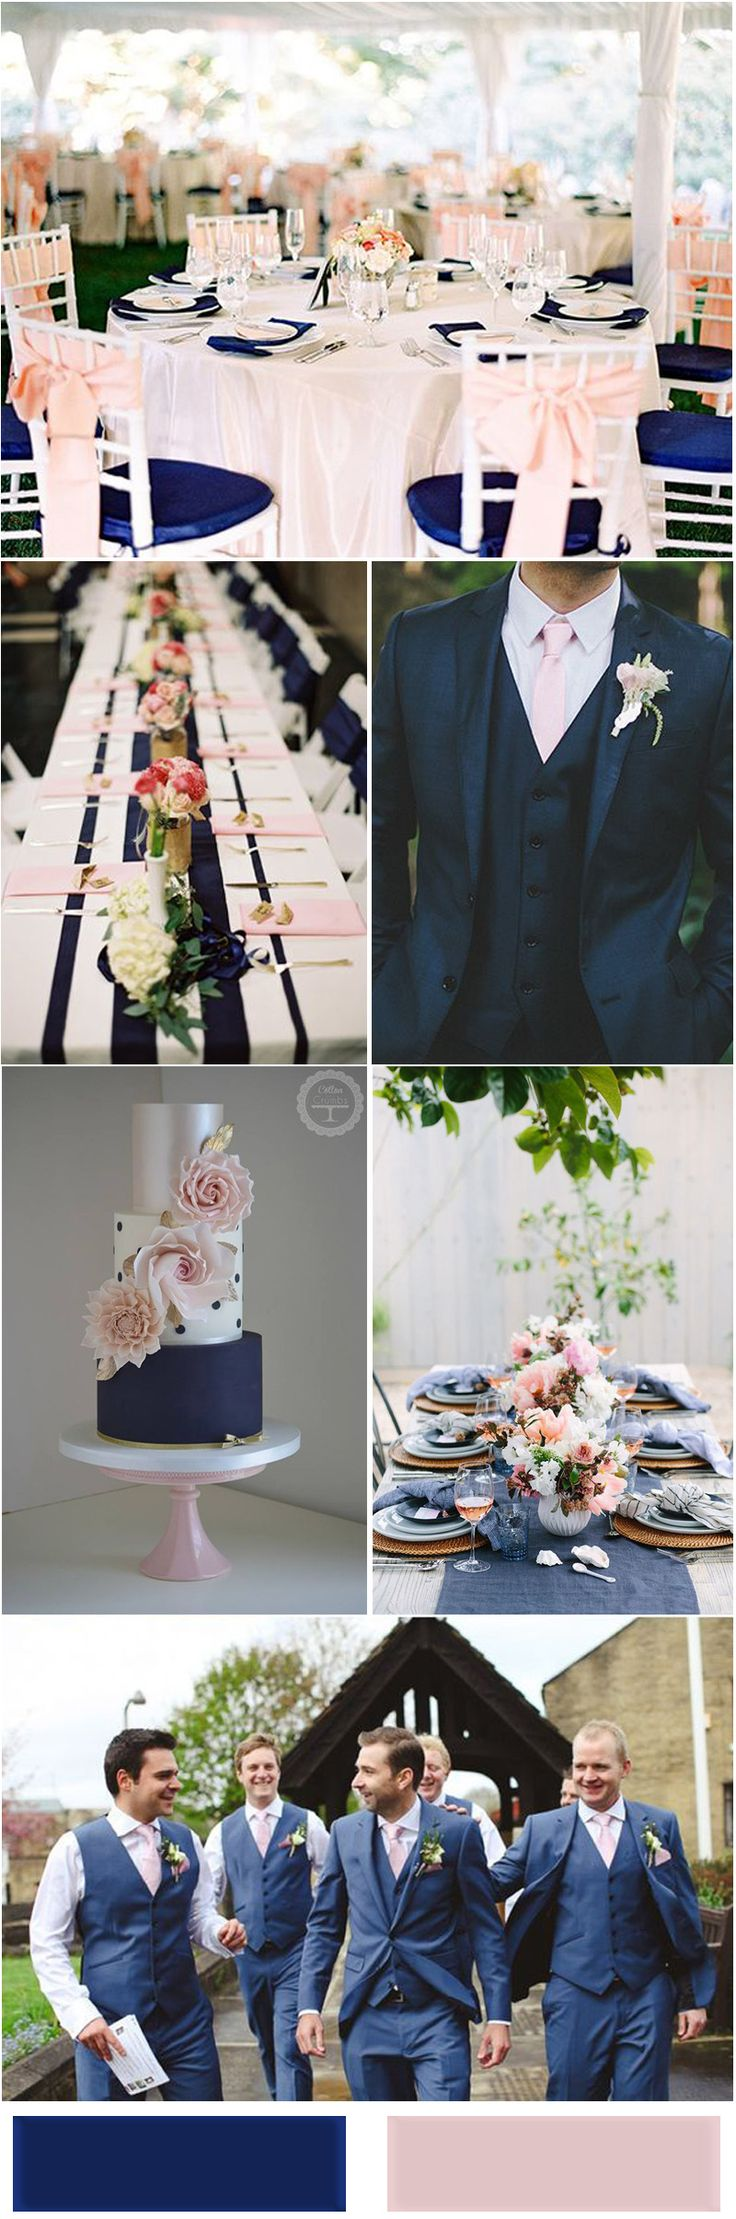 Best 25 Navy blush weddings ideas on Pinterest  Blush wedding colour theme 2015 wedding